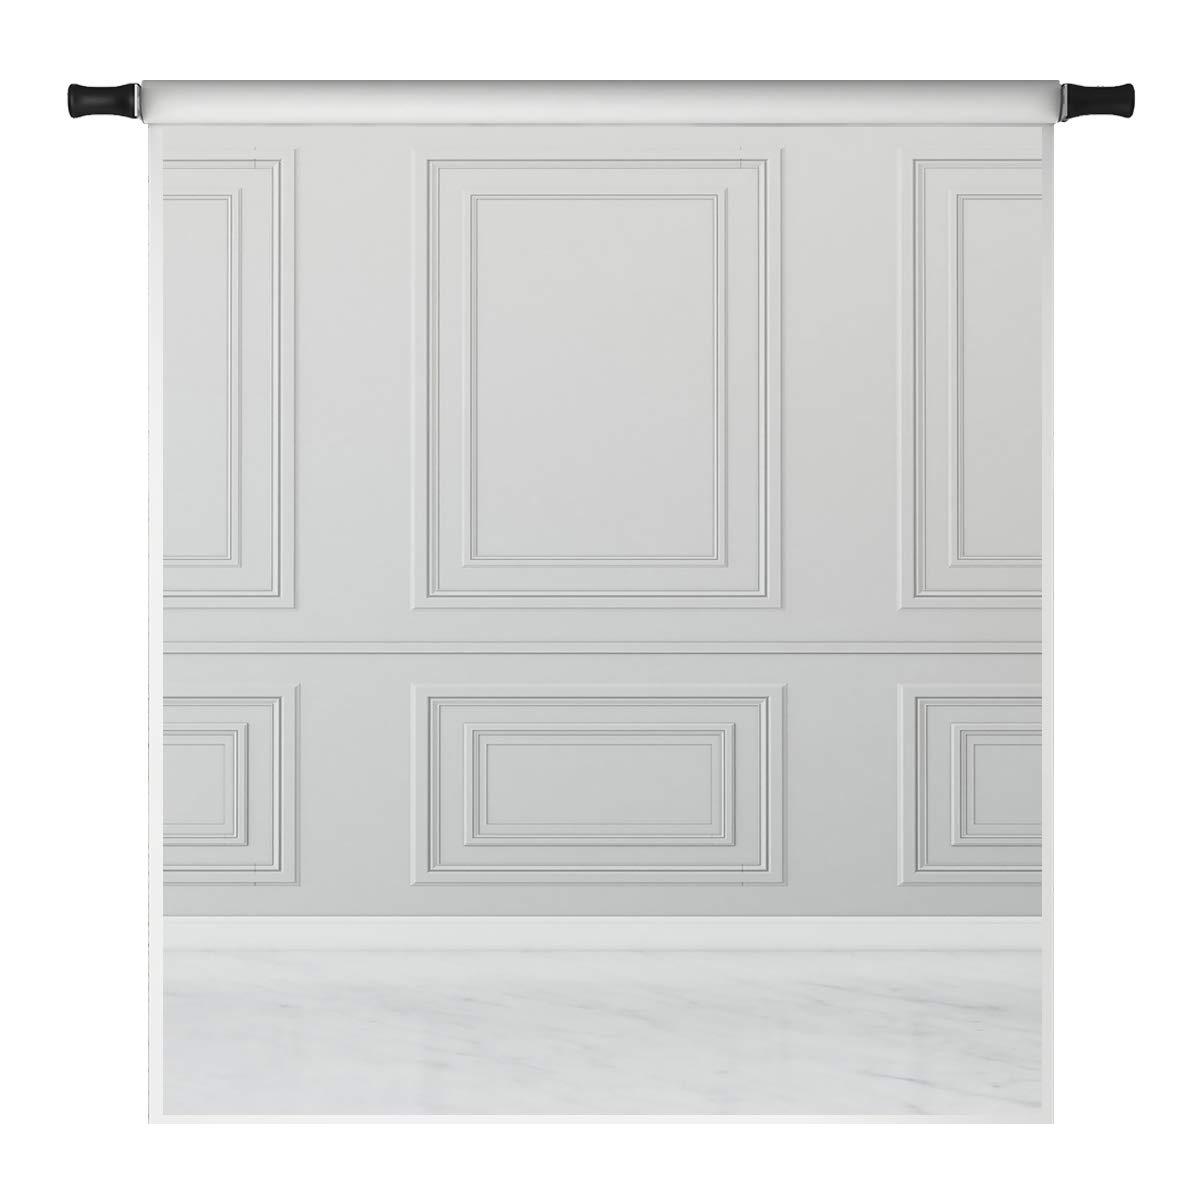 Kate 10x10ft Grey Wall Backdrops for Photoshoot Empty Room White Floor Classic Interior Design Microfiber Photo Studio Props